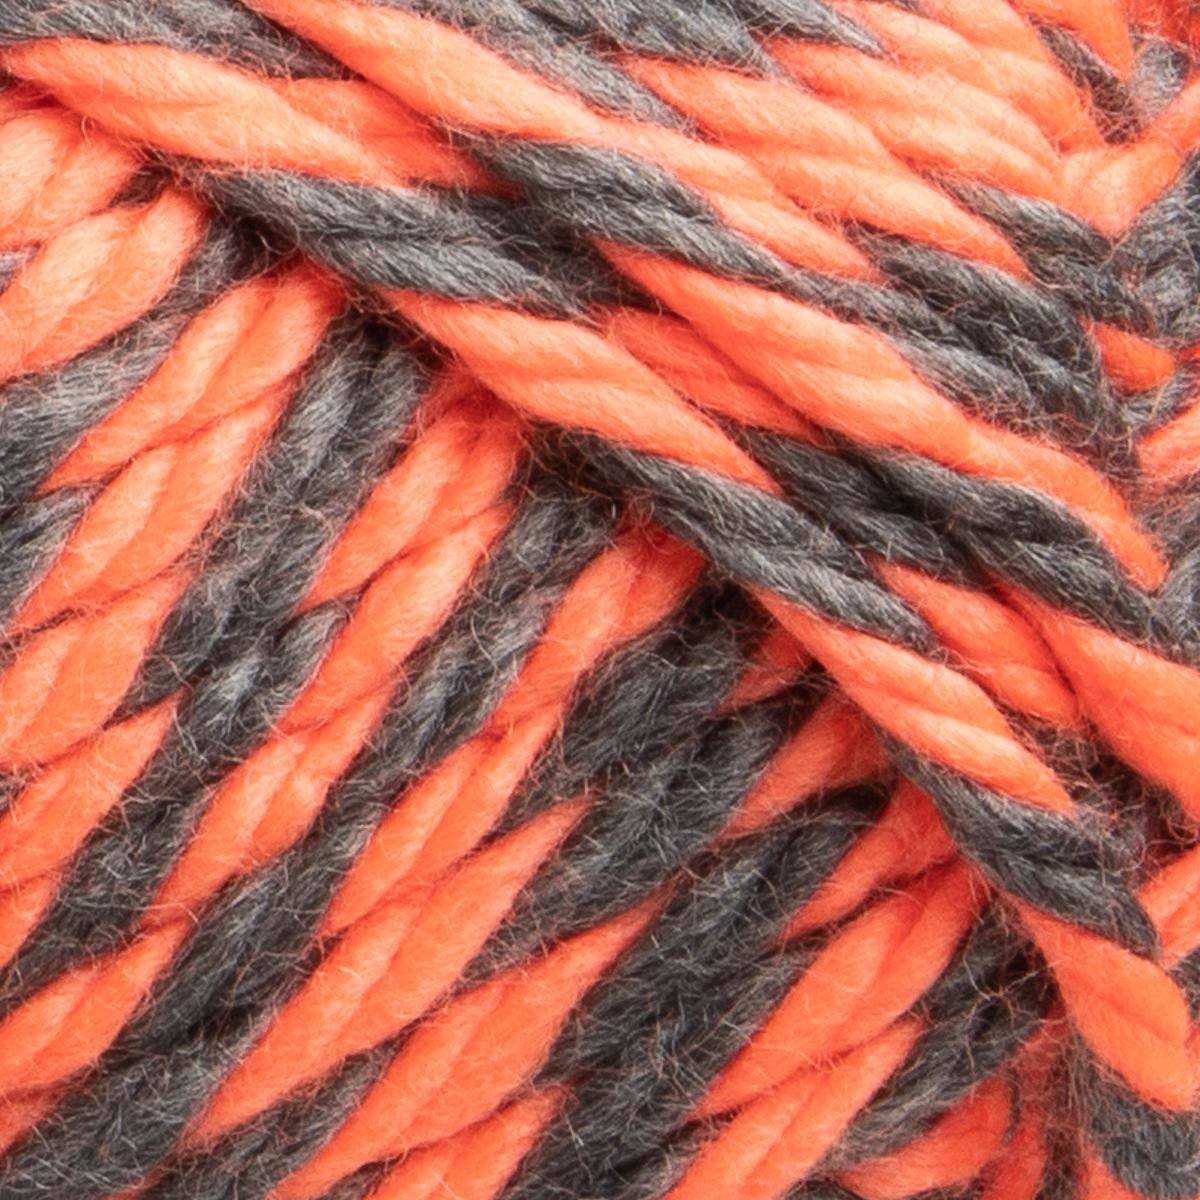 3pk-Lion-Brand-Hometown-USA-100-Acrylic-Yarn-Super-Bulky-6-Knit-Crochet-Skeins thumbnail 10